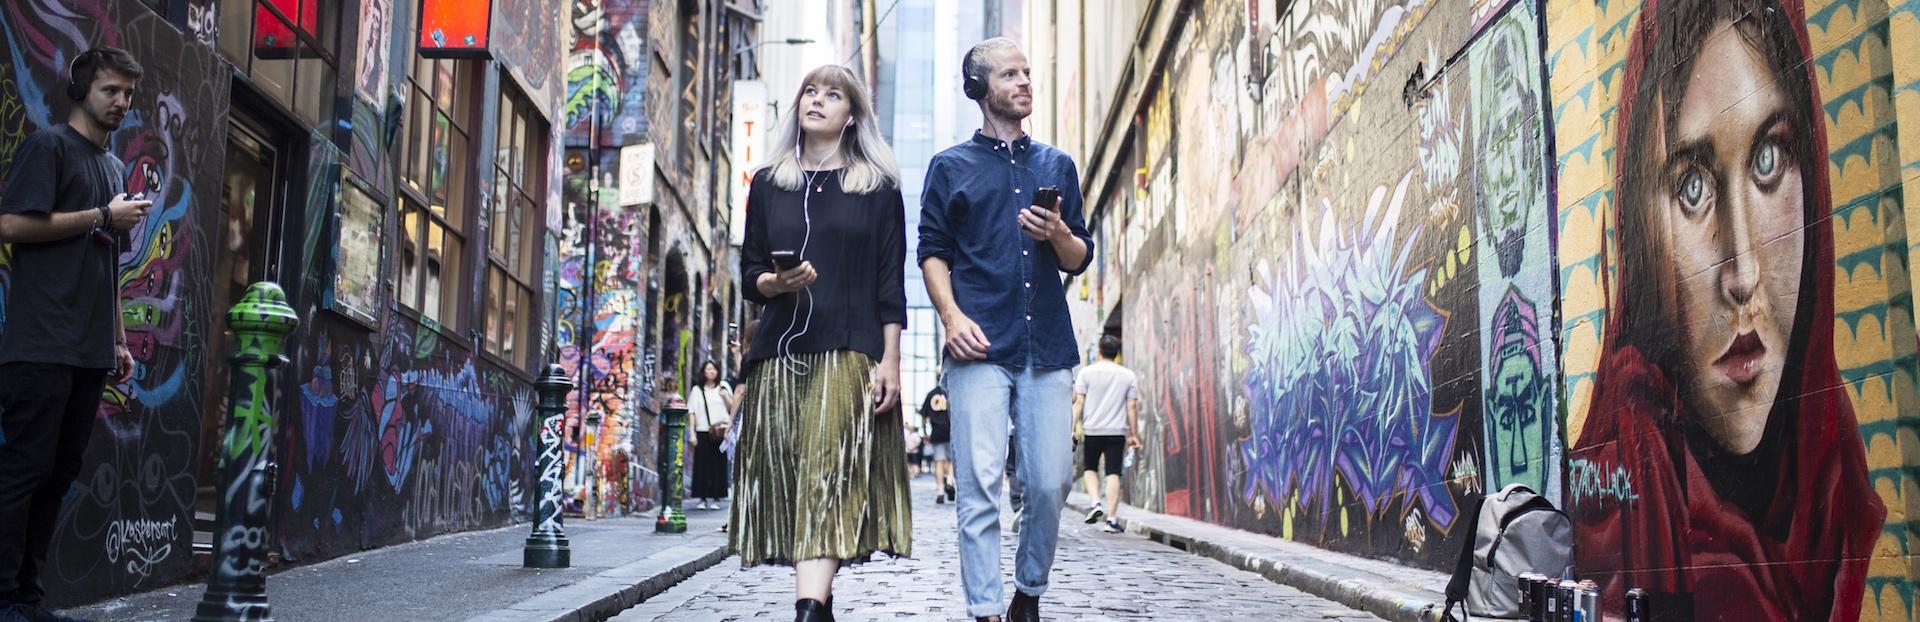 Melbourne audio tour